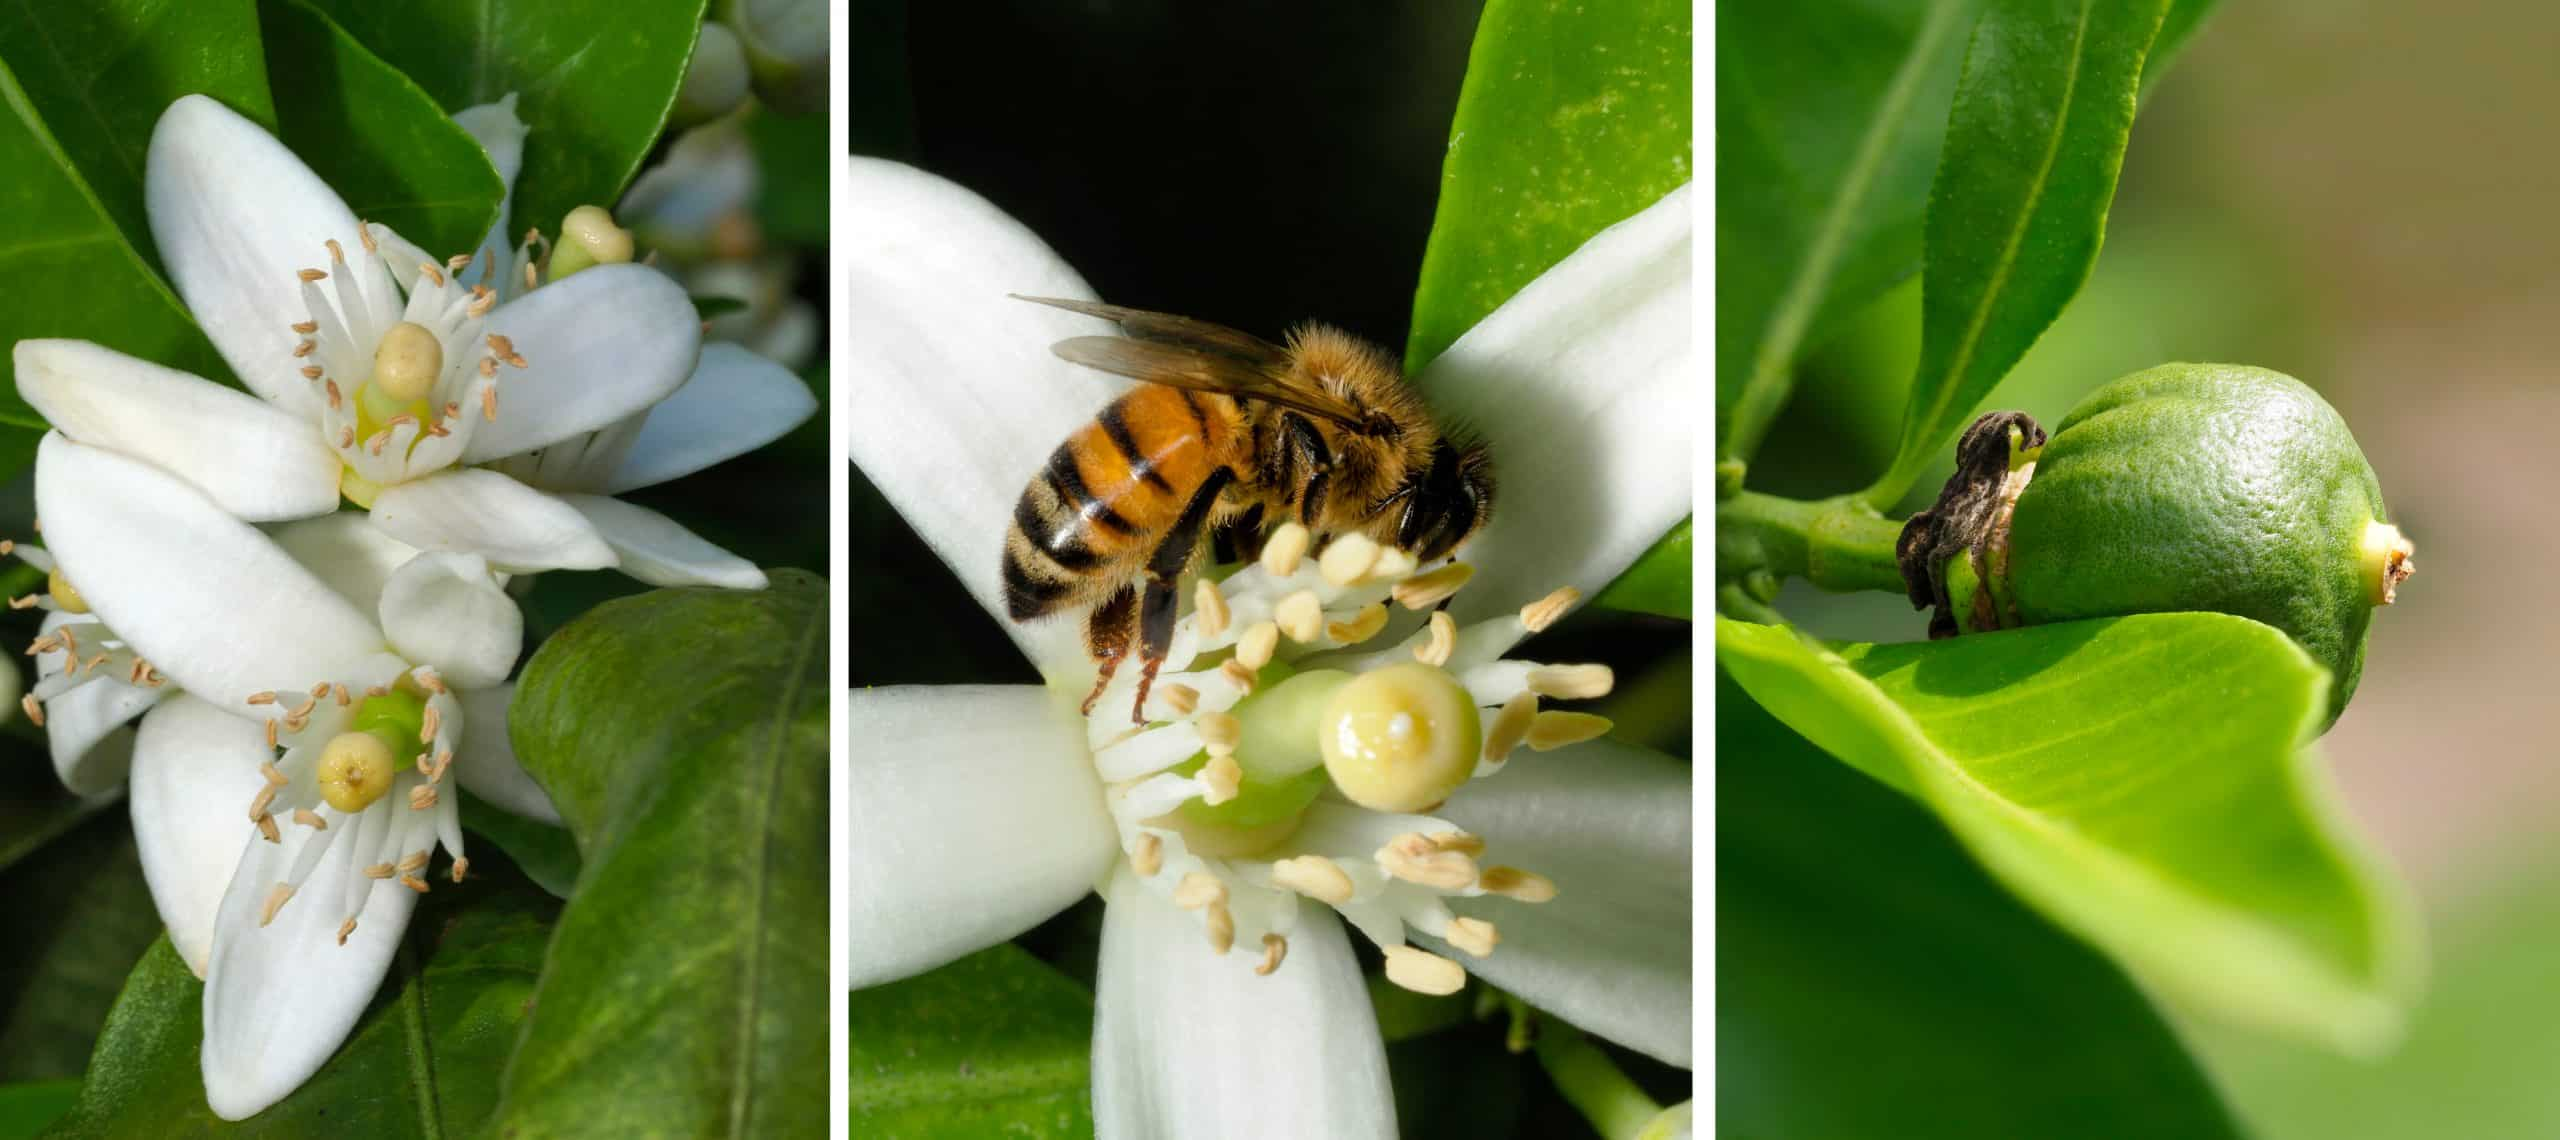 Honeybee Pollinating Orangeblossom Before It Becomes An Orange